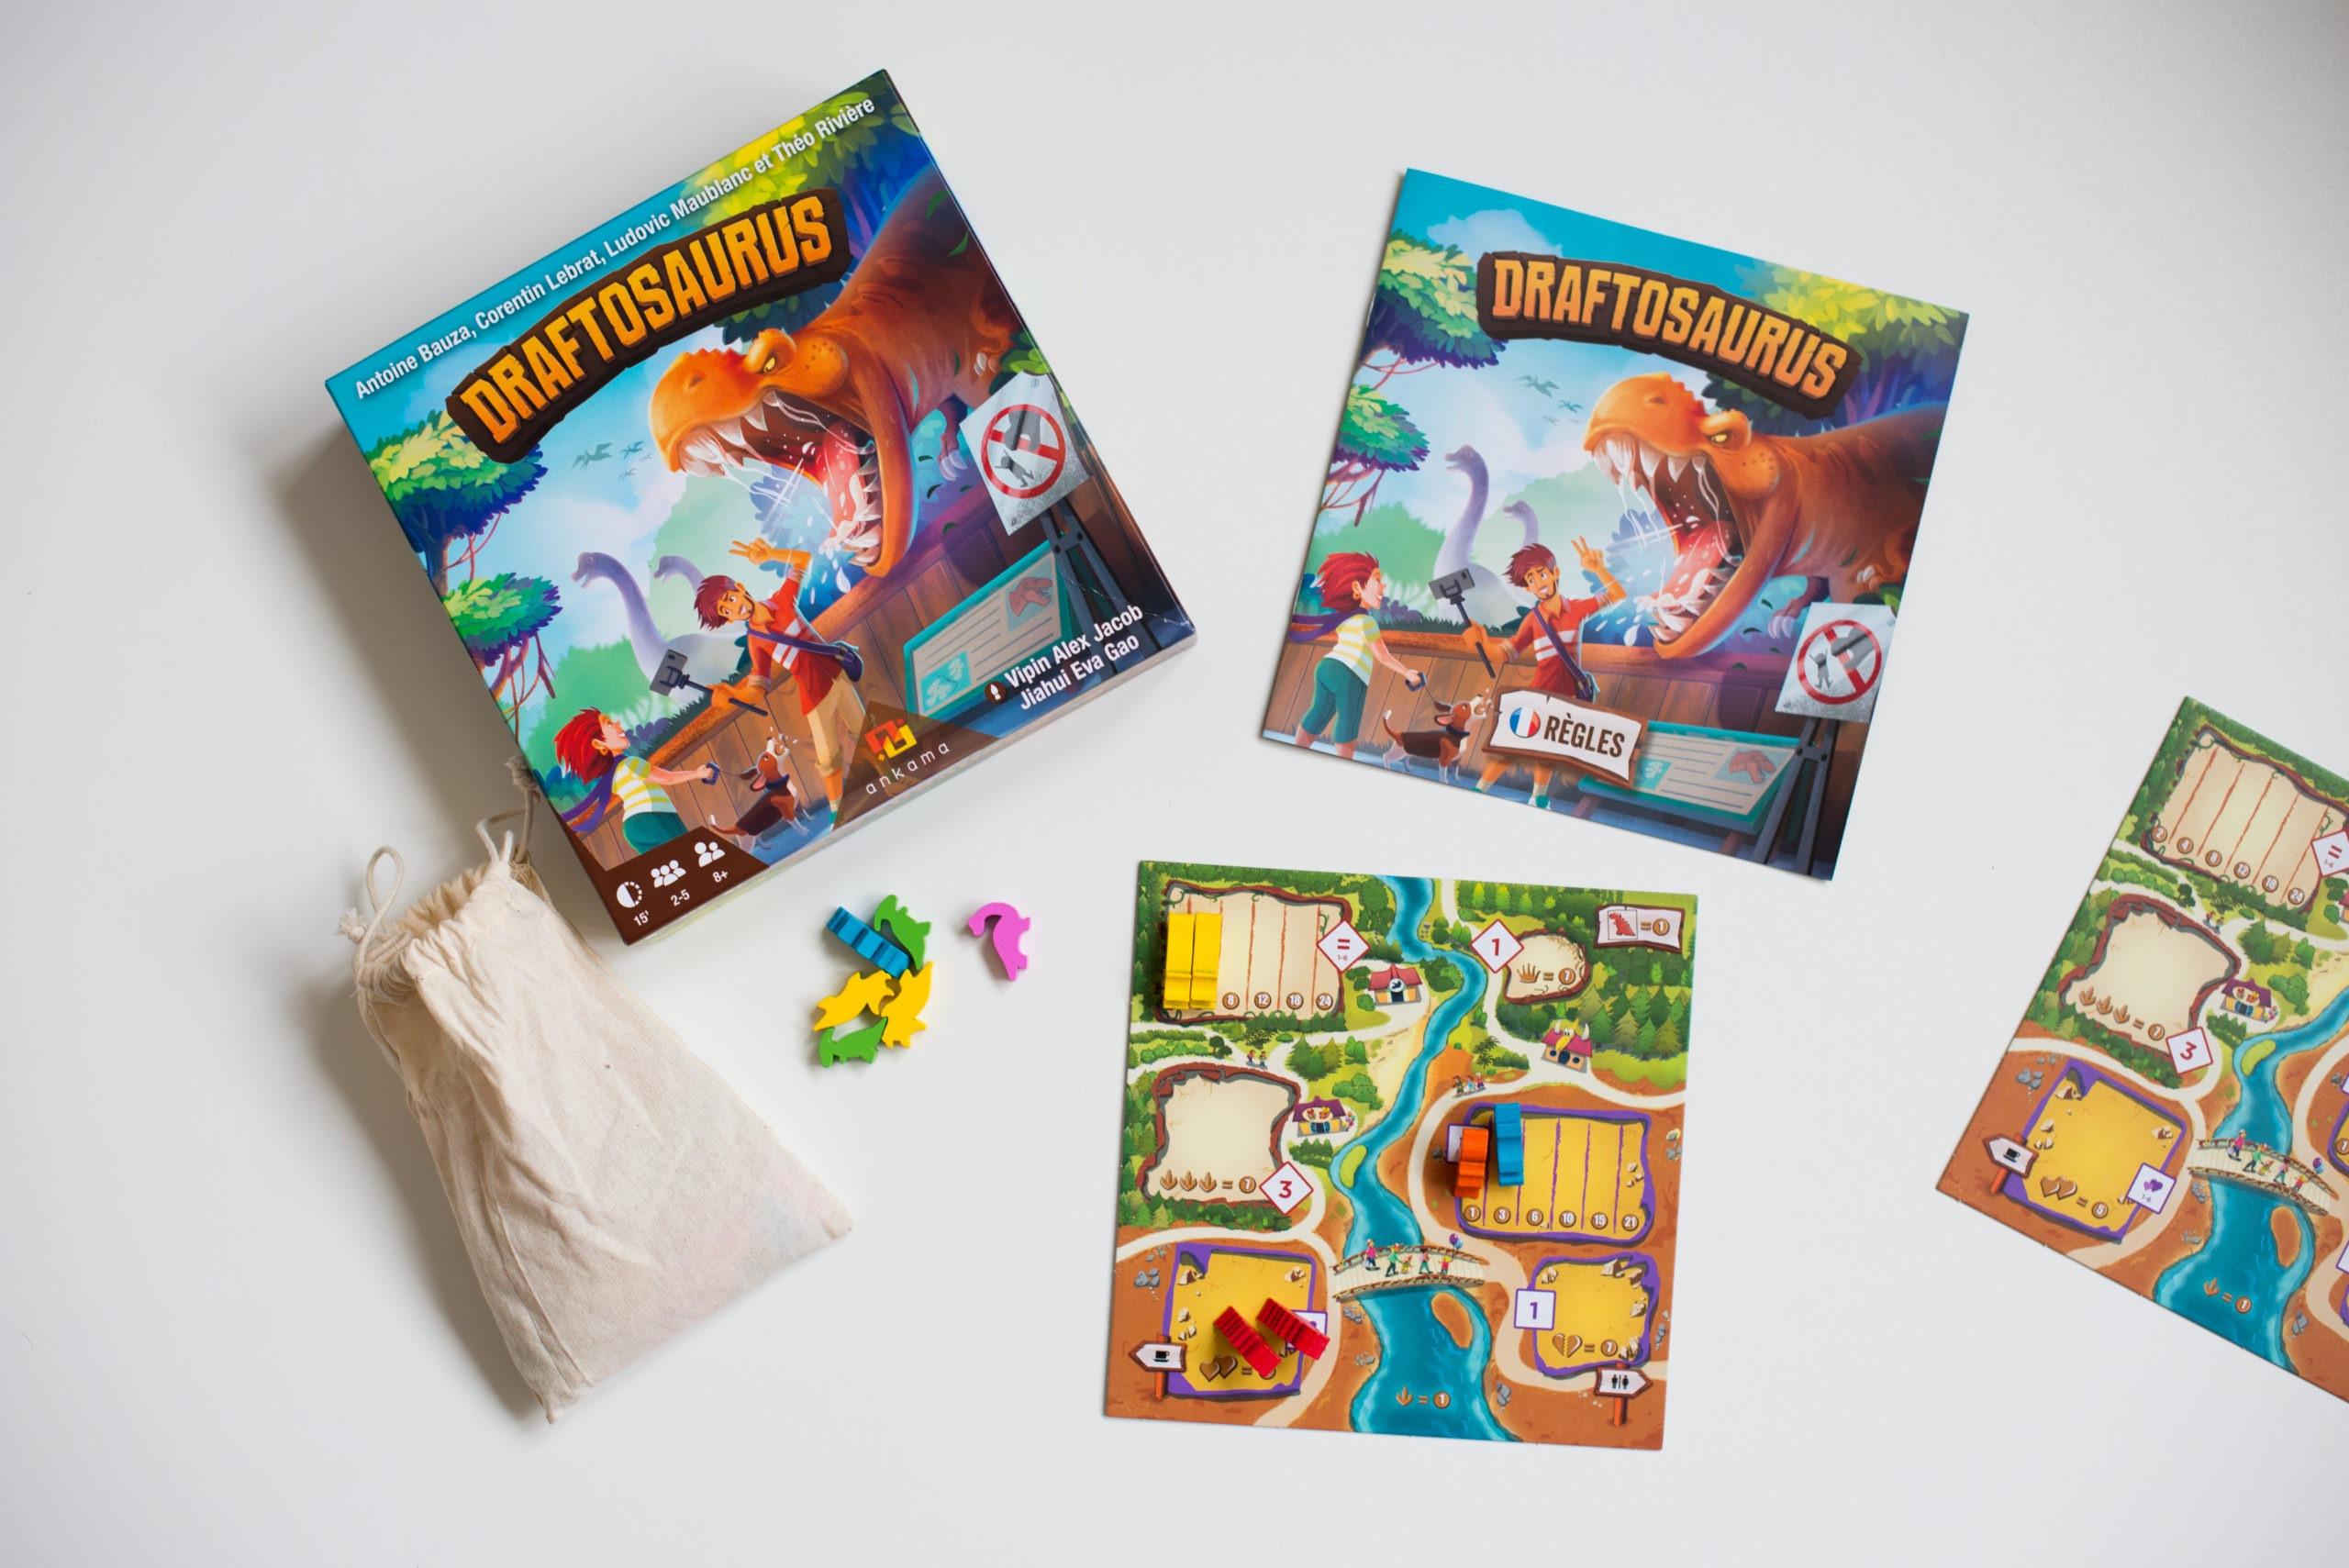 dratfosaurus, jeu famille, enfants, avis, test